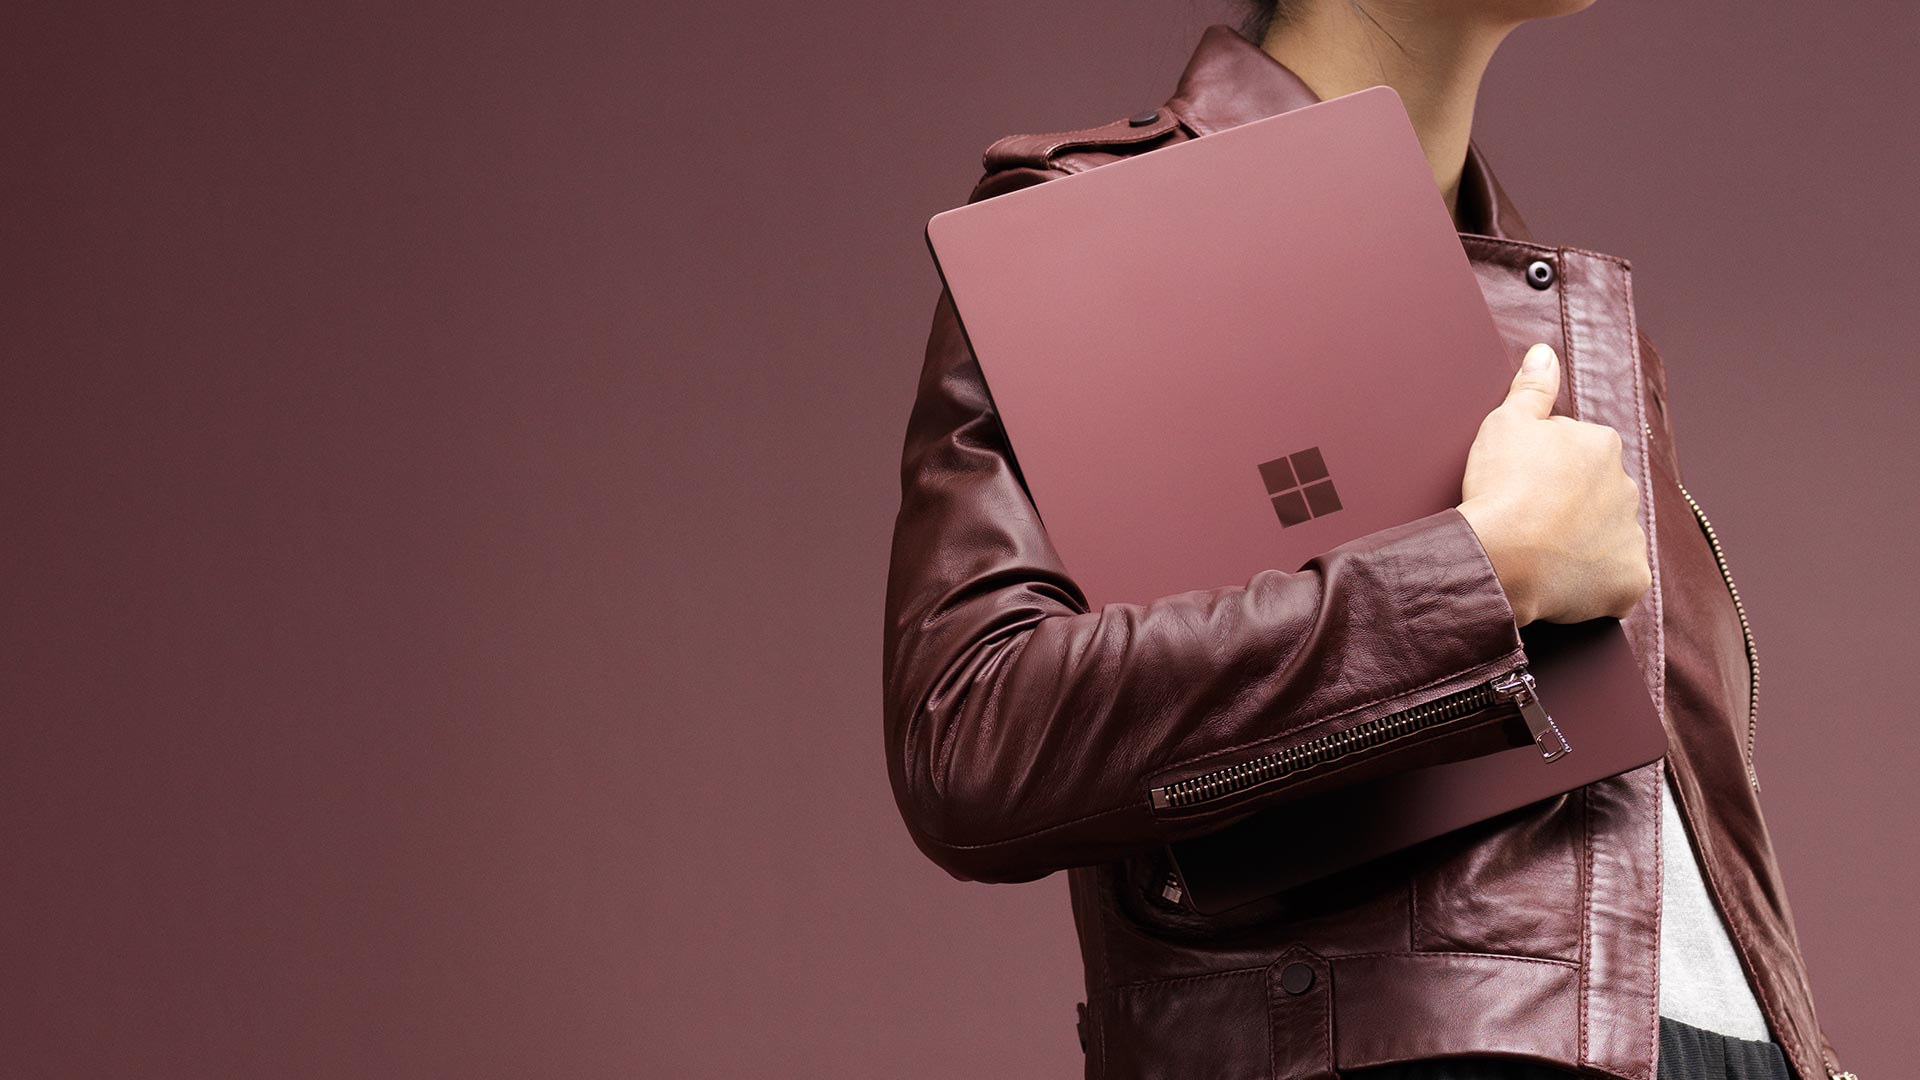 Frau mit Surface Laptop in Burgunderrot